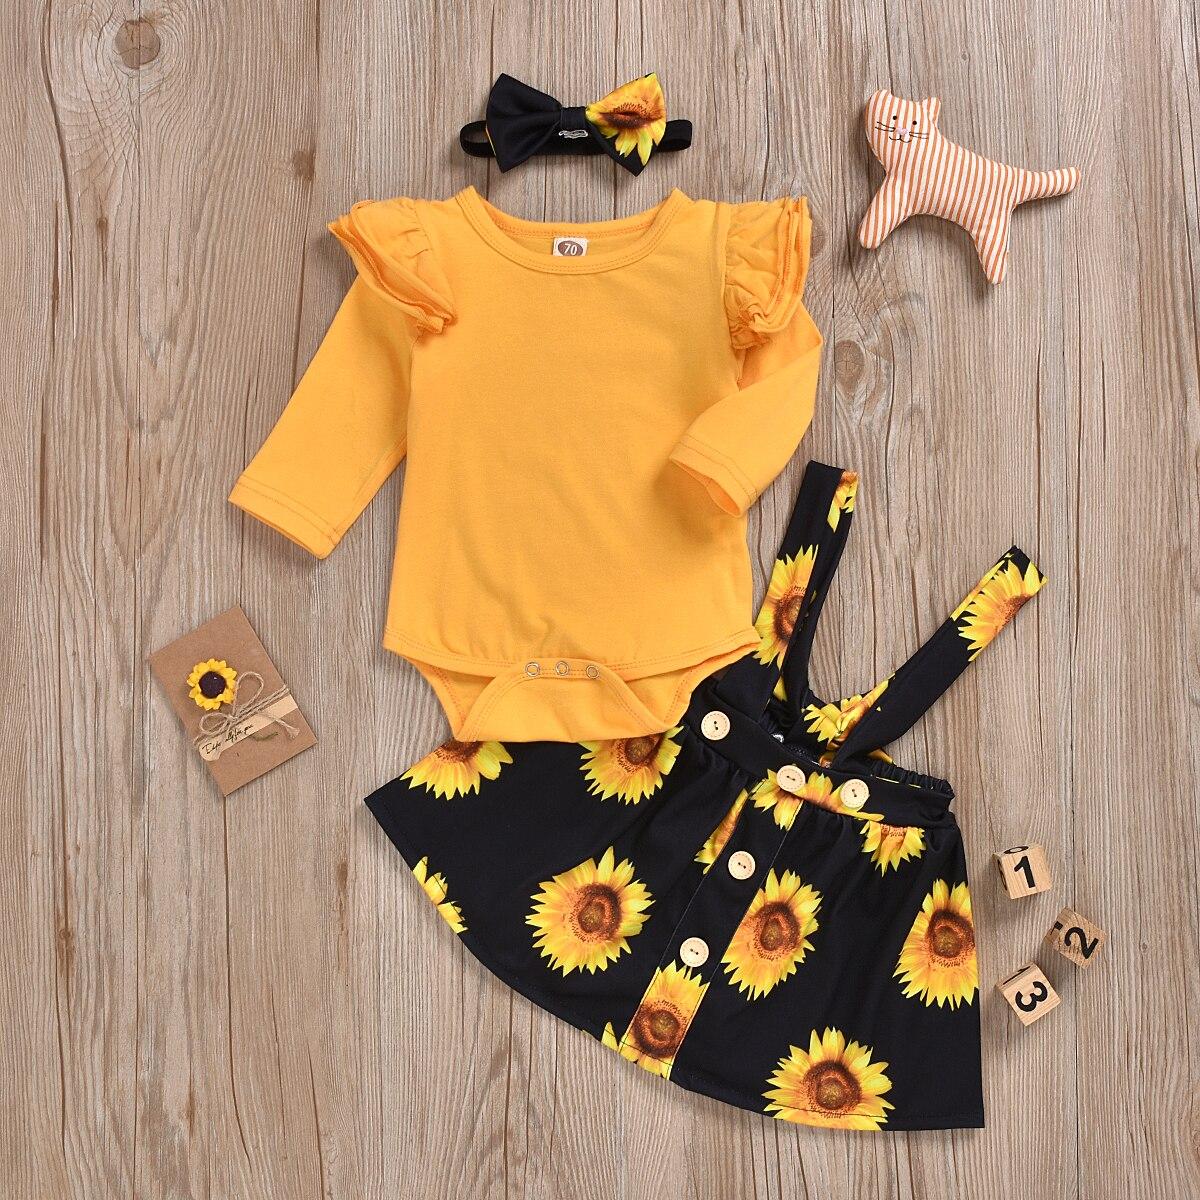 2020 Princess Girl Toddler Baby Girls Clothes  Yellow Sunflower Sunsuit Floral Spring Dress Sundress Clothes Set